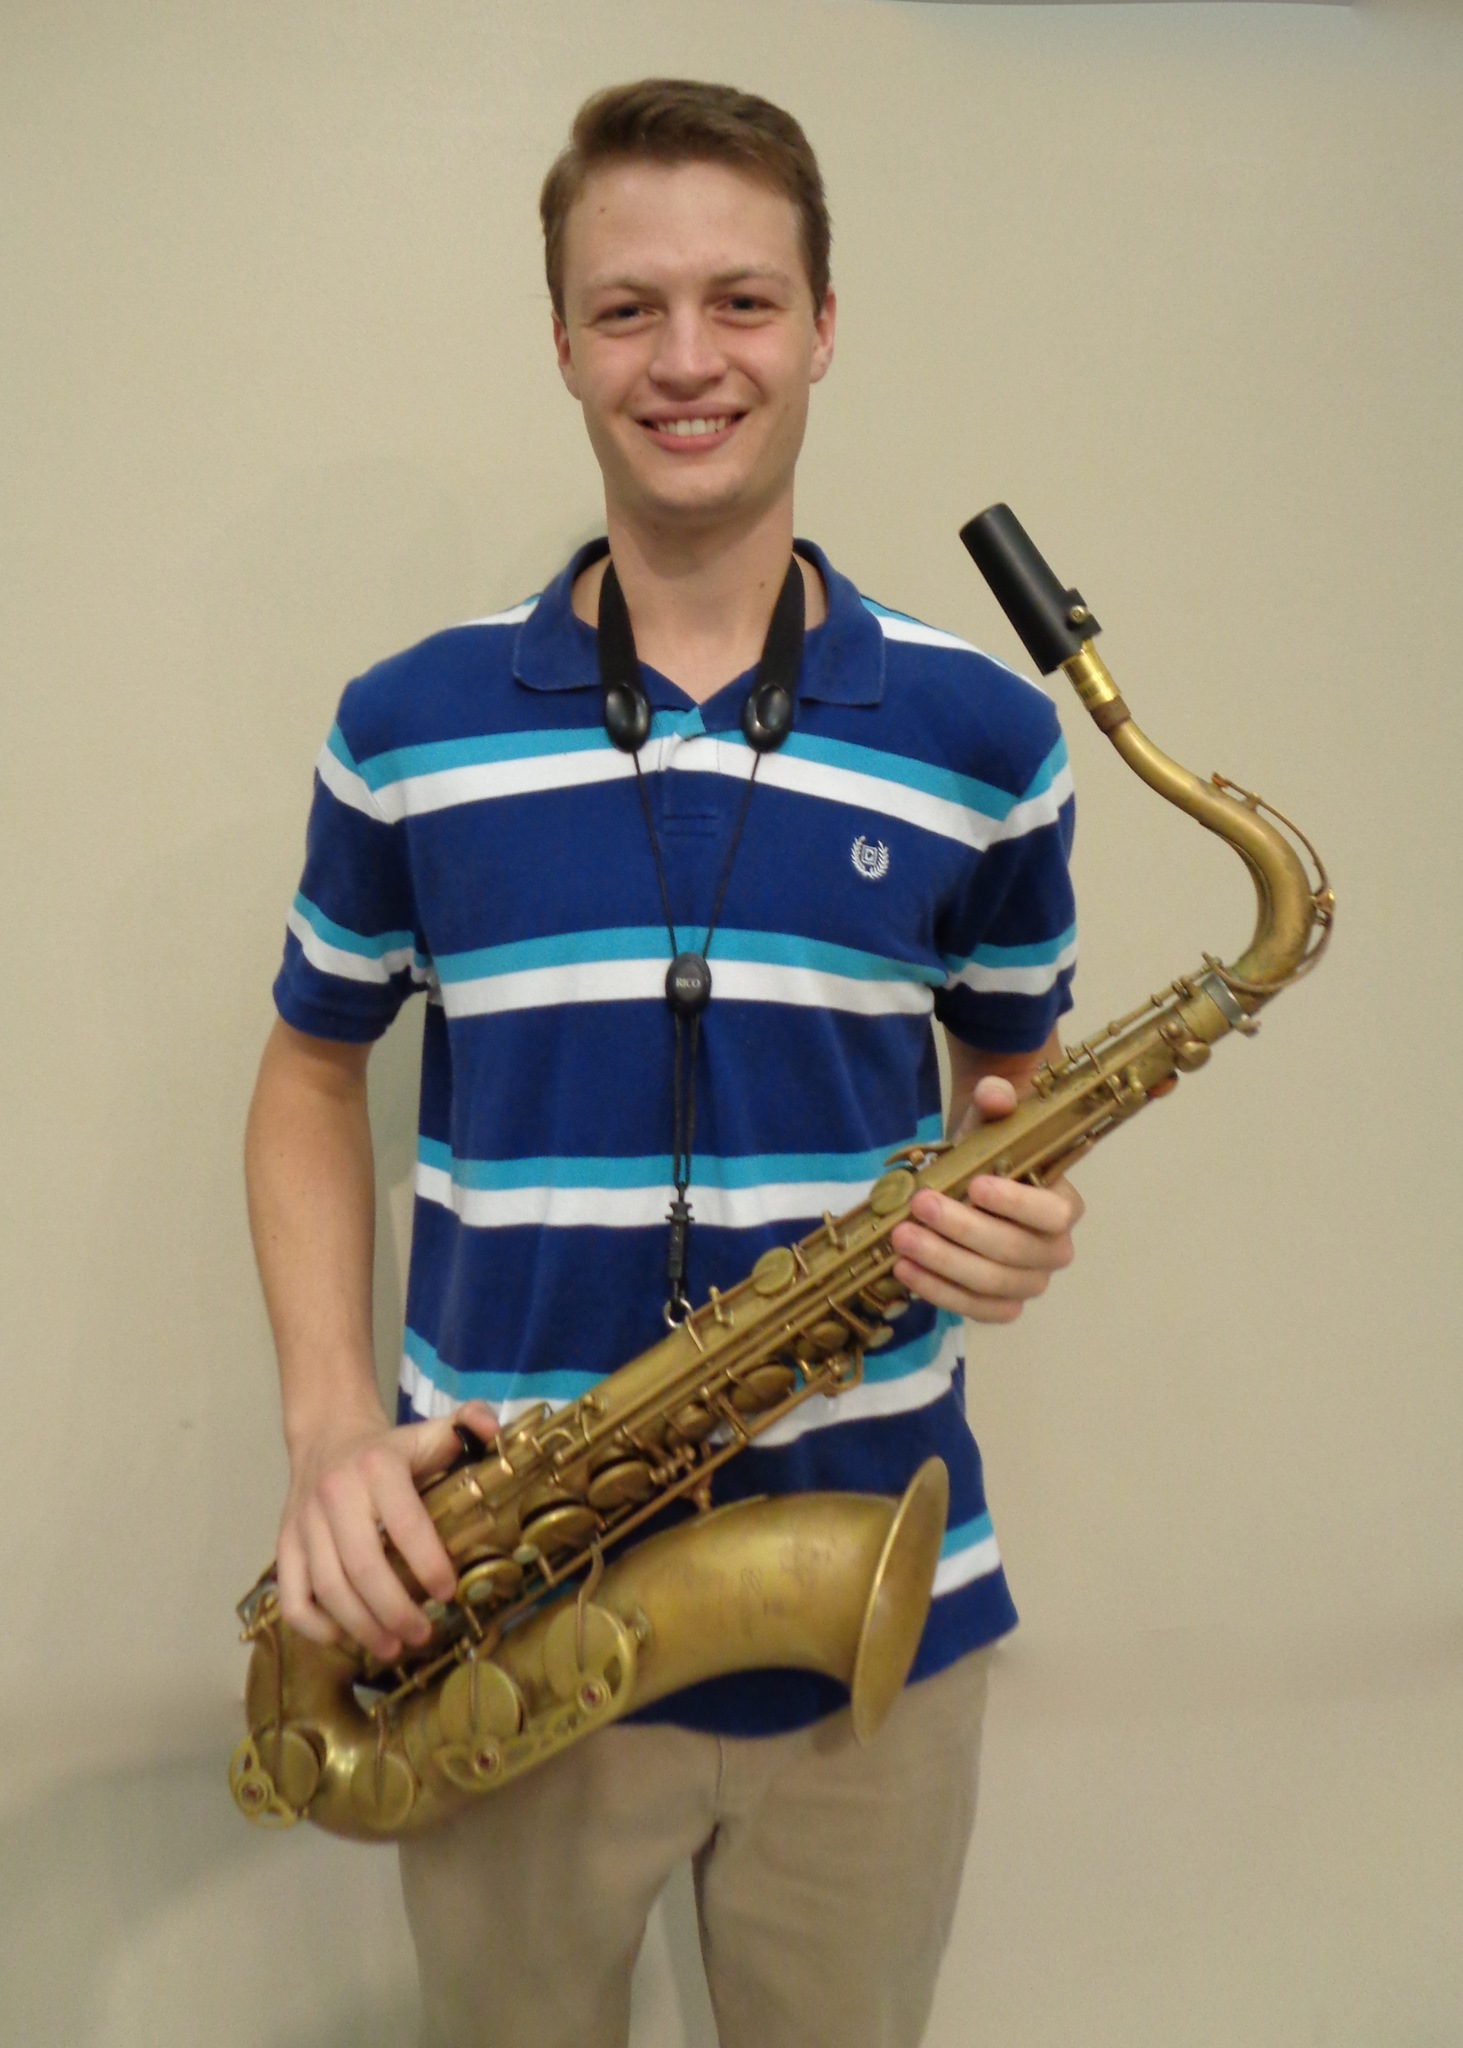 alex mann, music education pipersville, pa